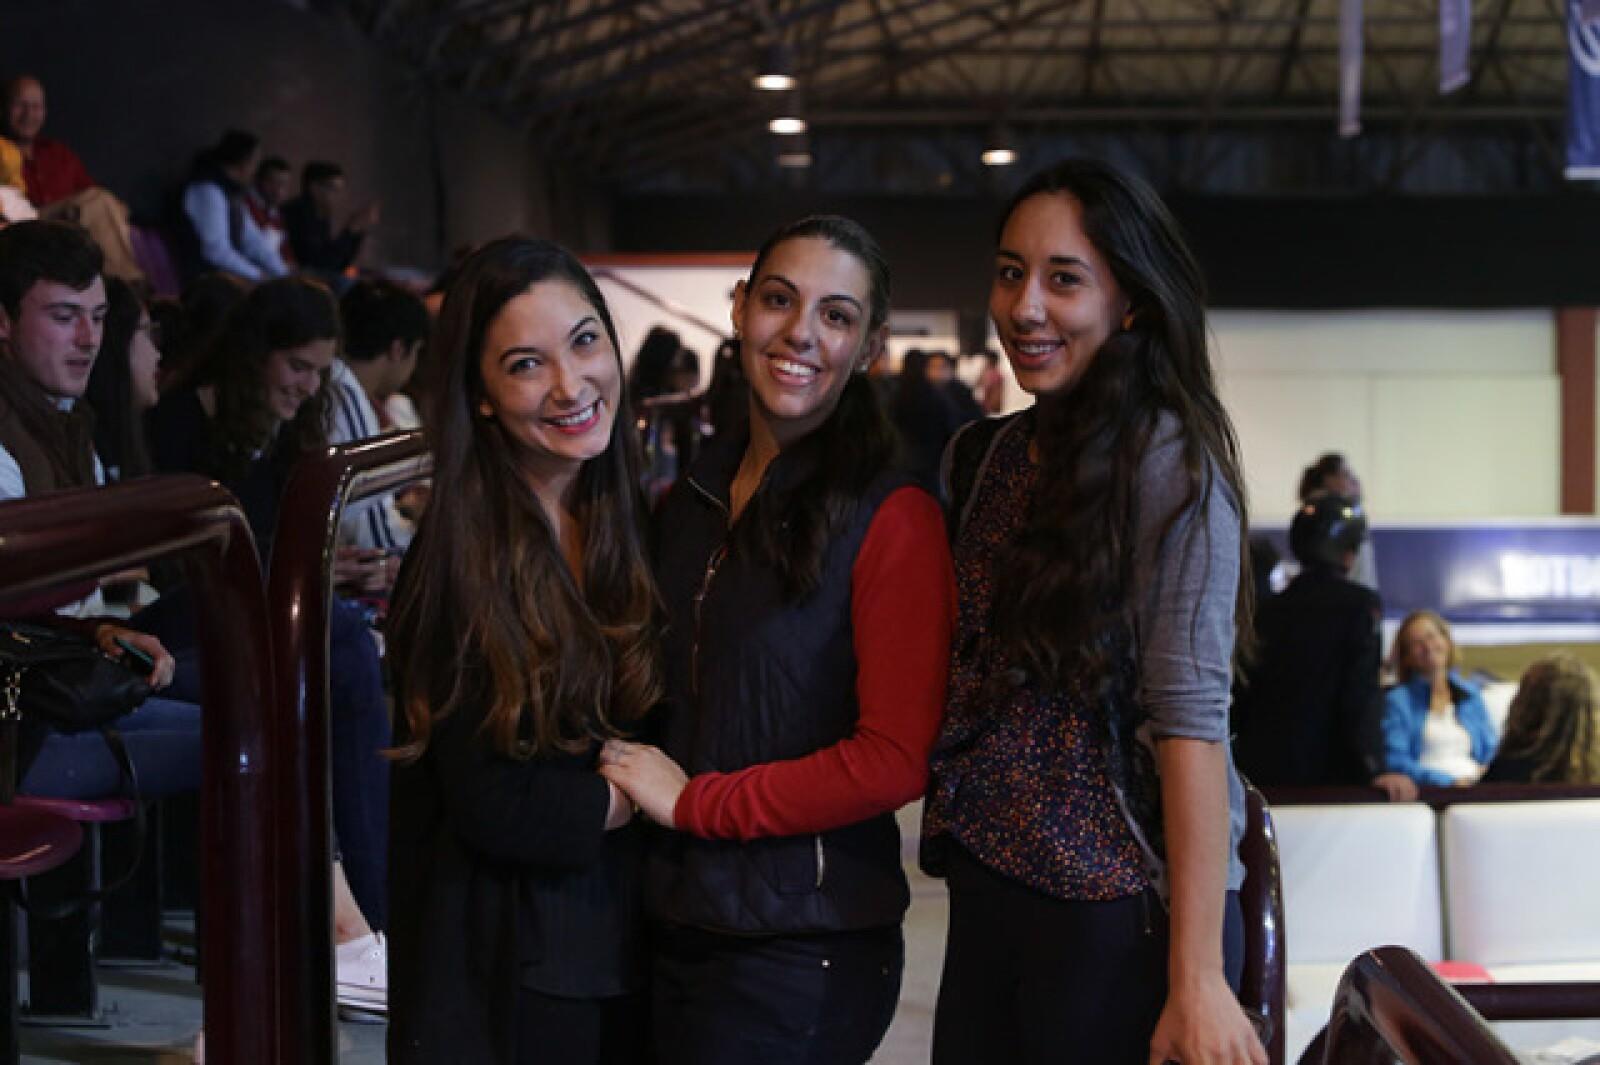 z,Estefanía NavaRoxana Nava y Alejandra Gonzále